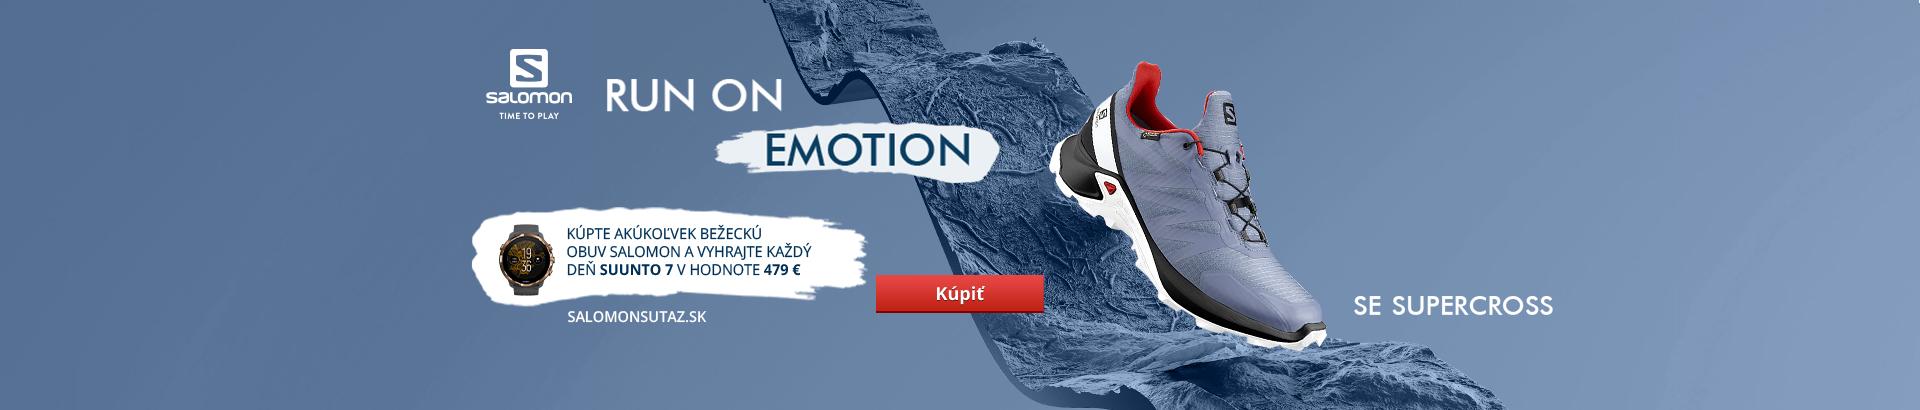 Run on emotion